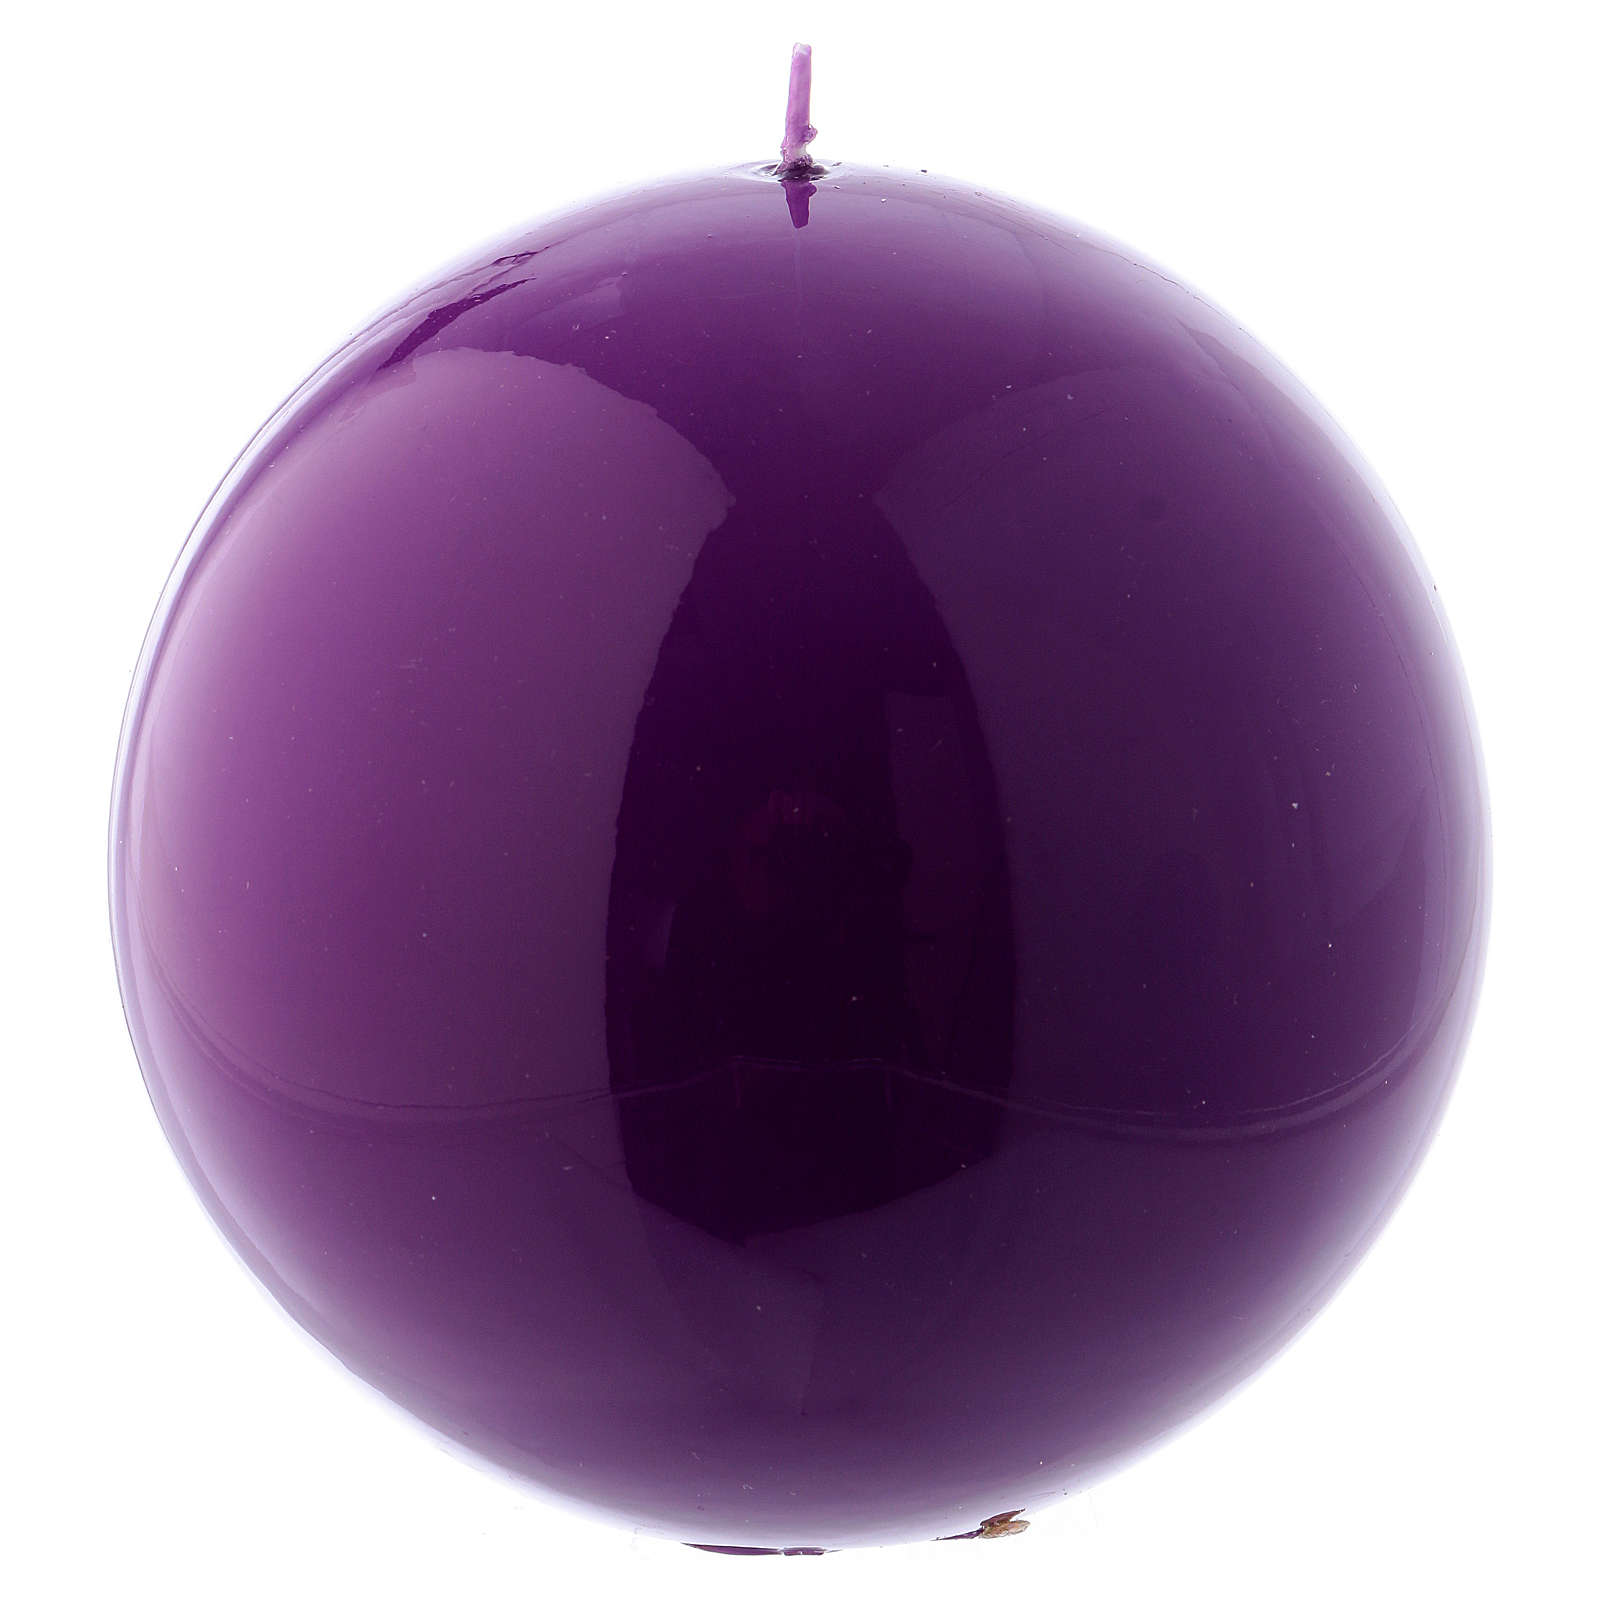 Kerze Siegellack Kugel Form violetten 12cm 3